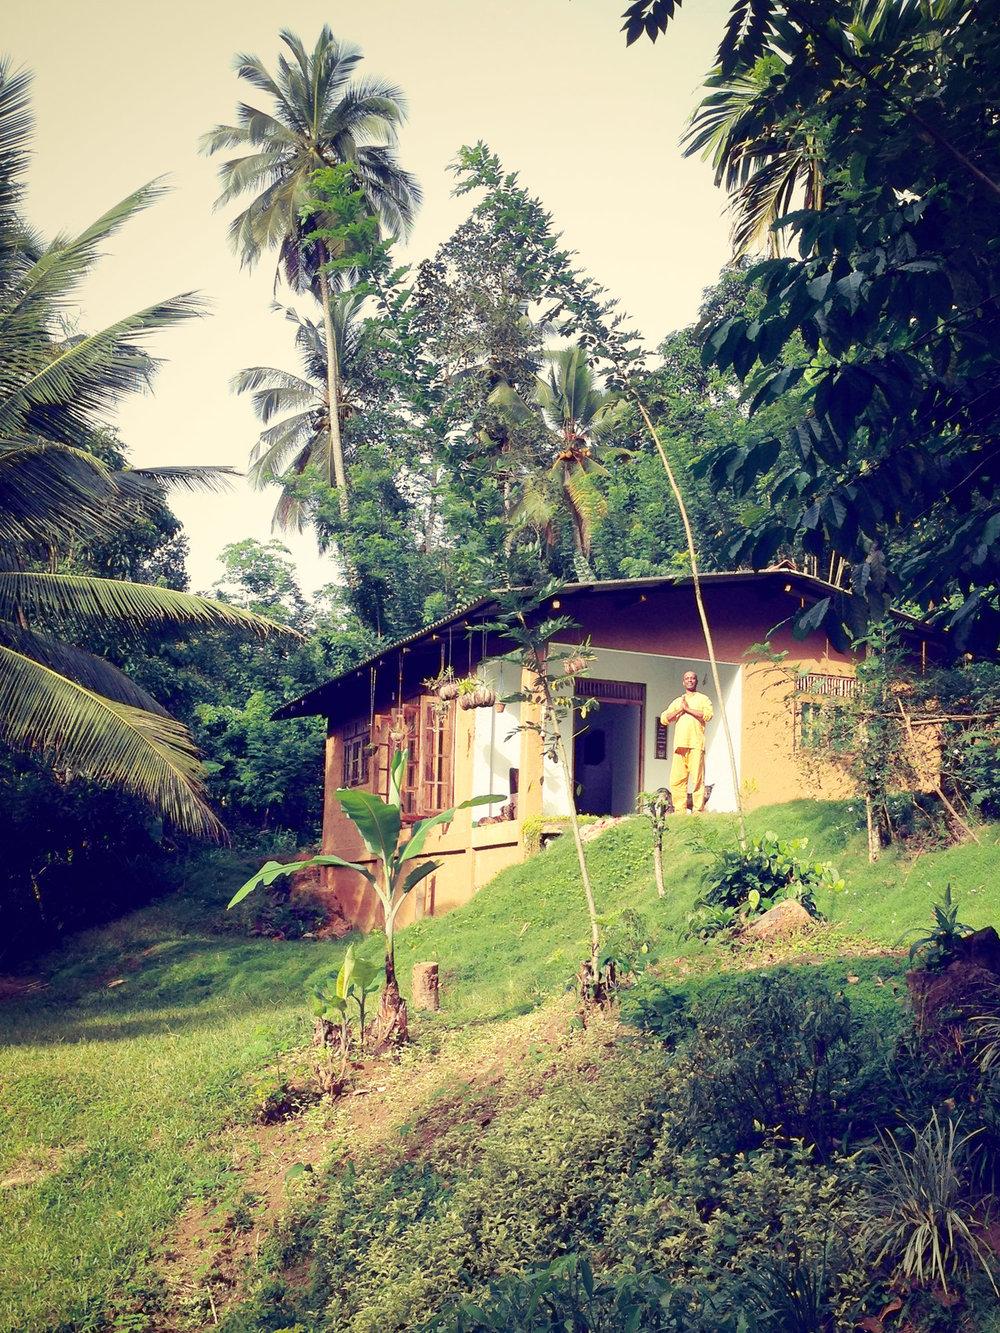 Home of Yoga Master Nnoyel